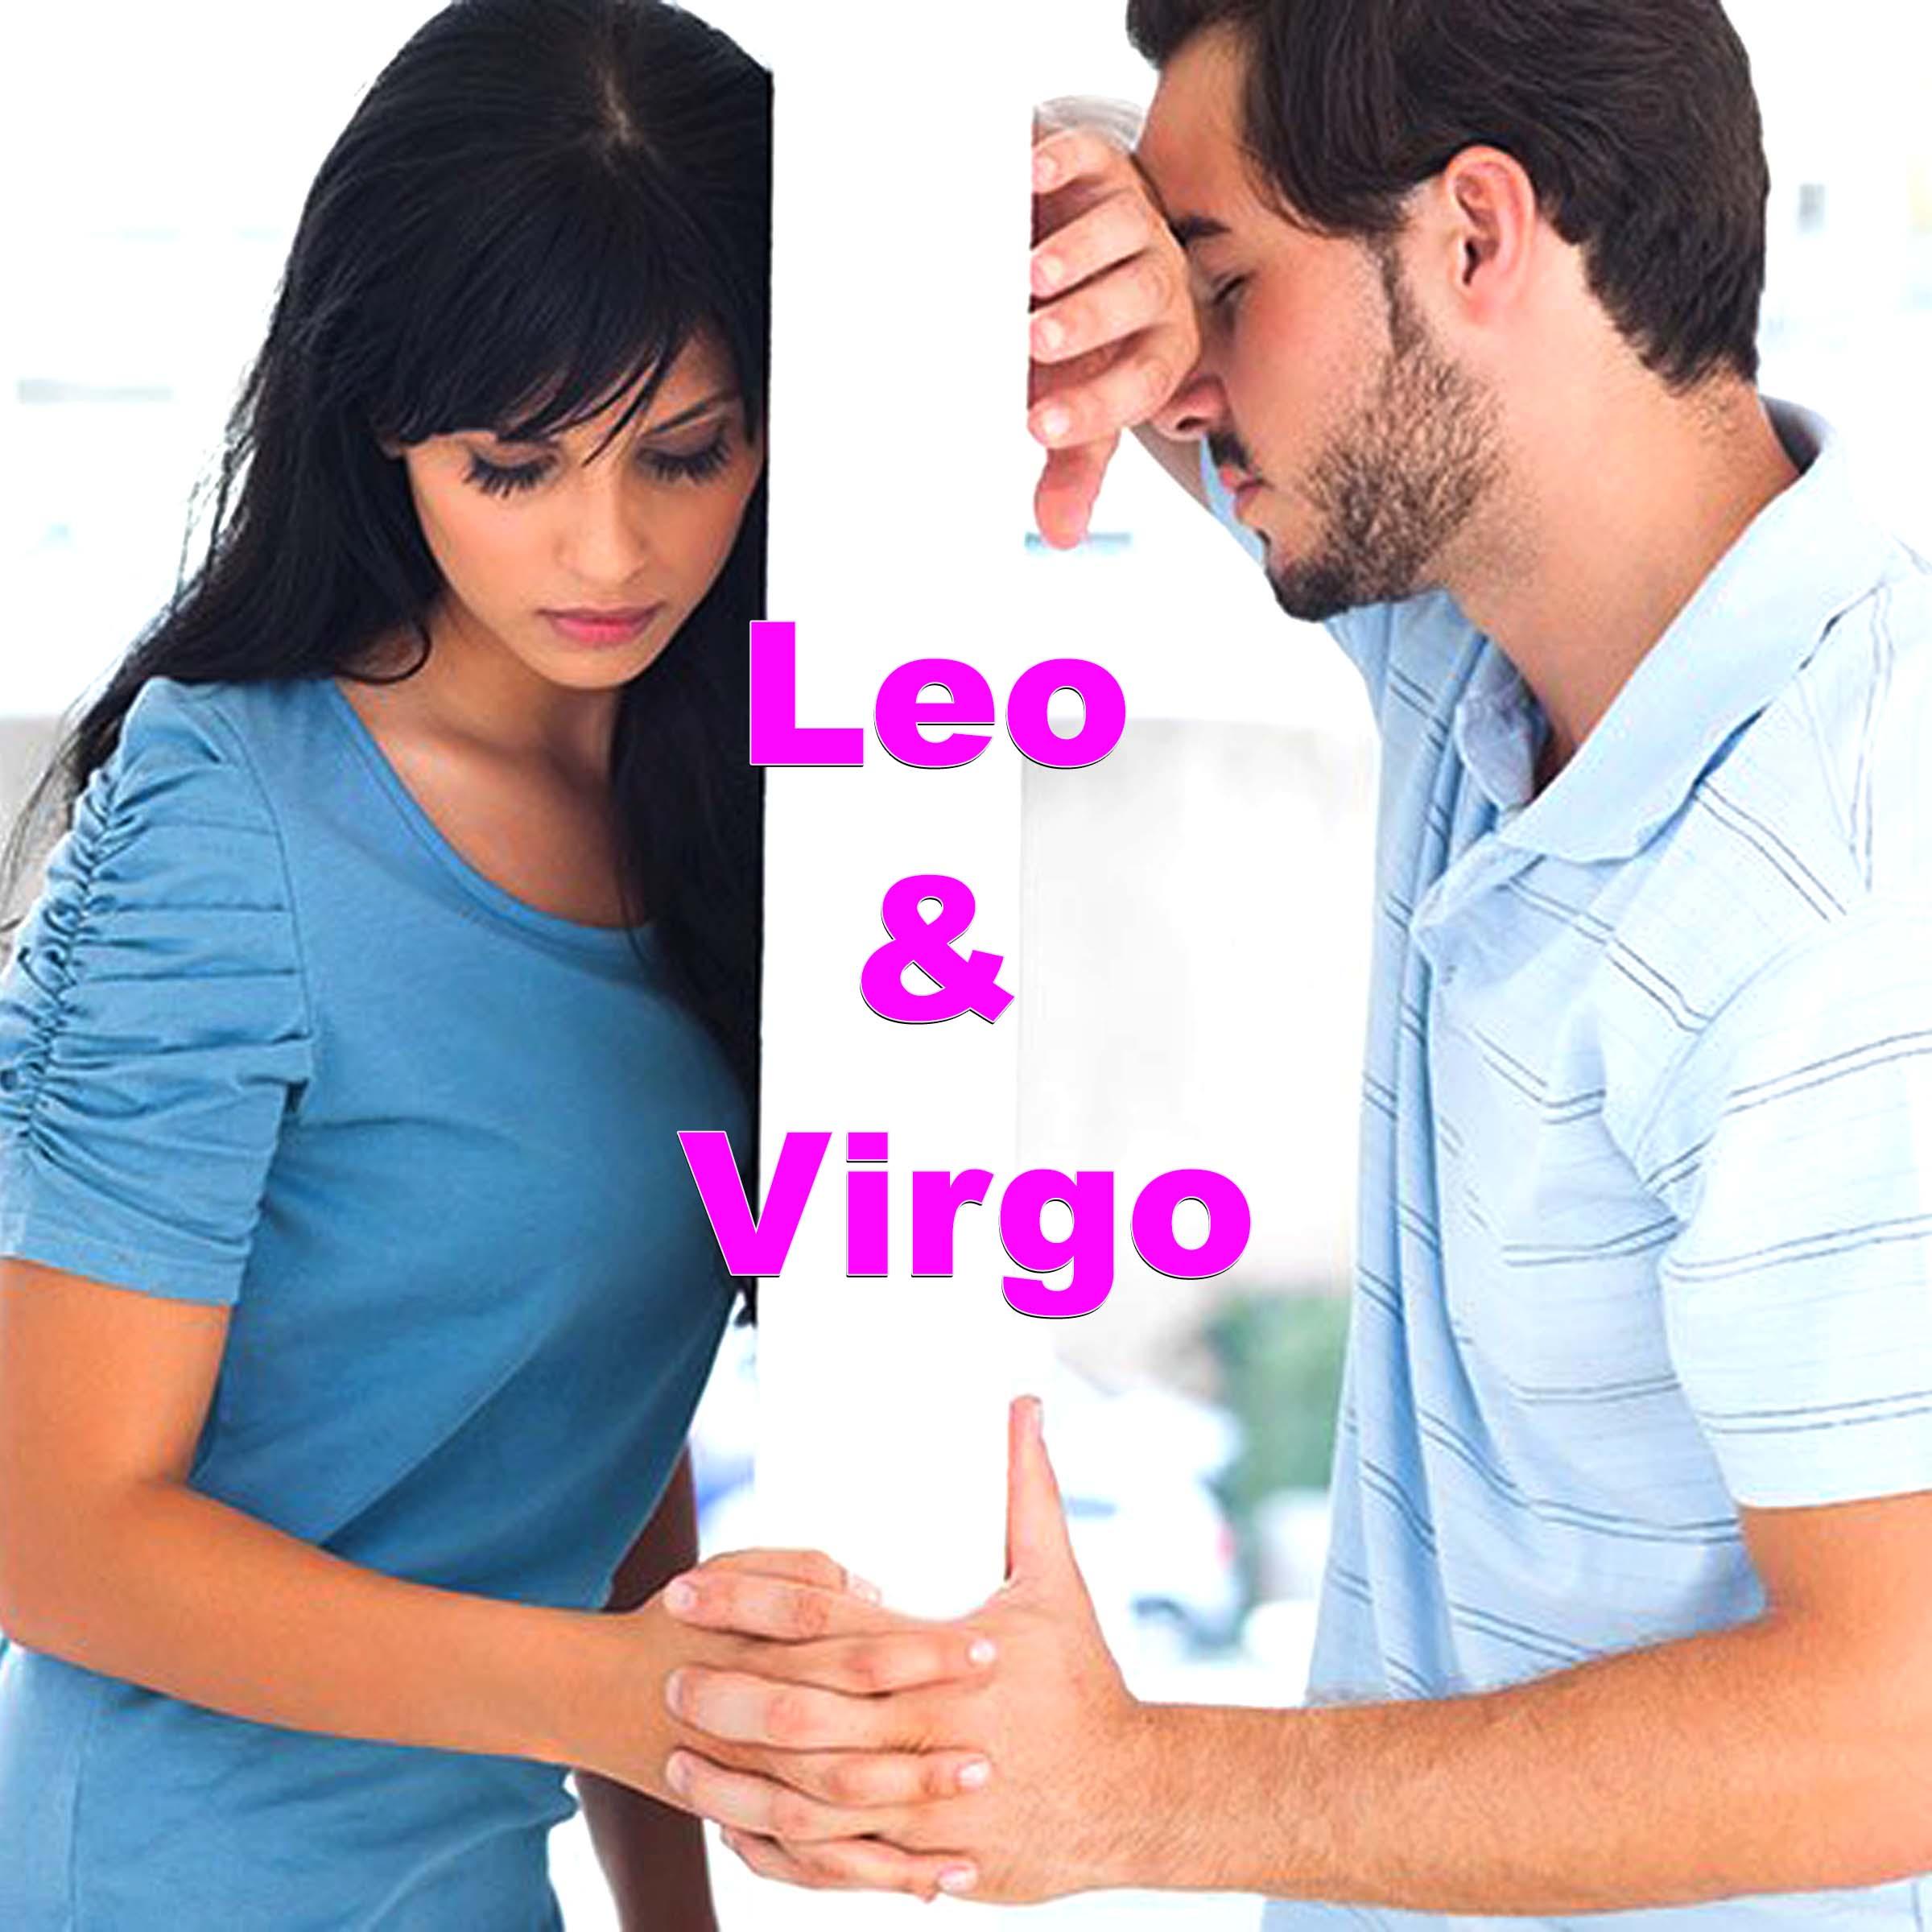 Leo n Virgo Compatibility